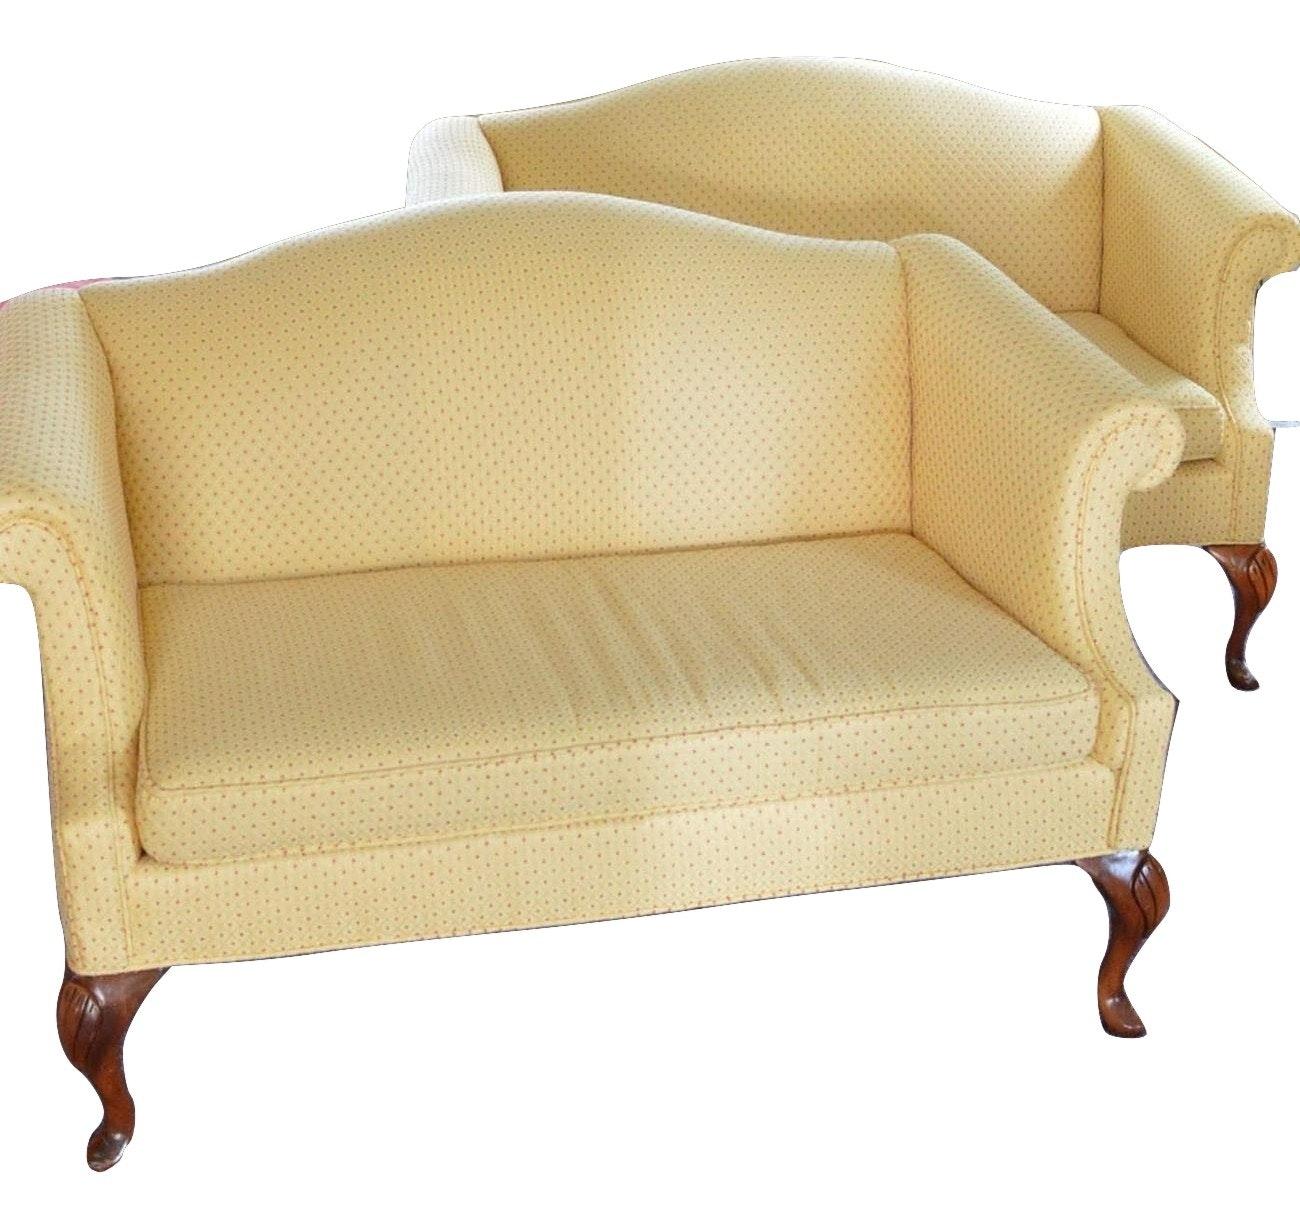 Pair of Upholstered Loveseats